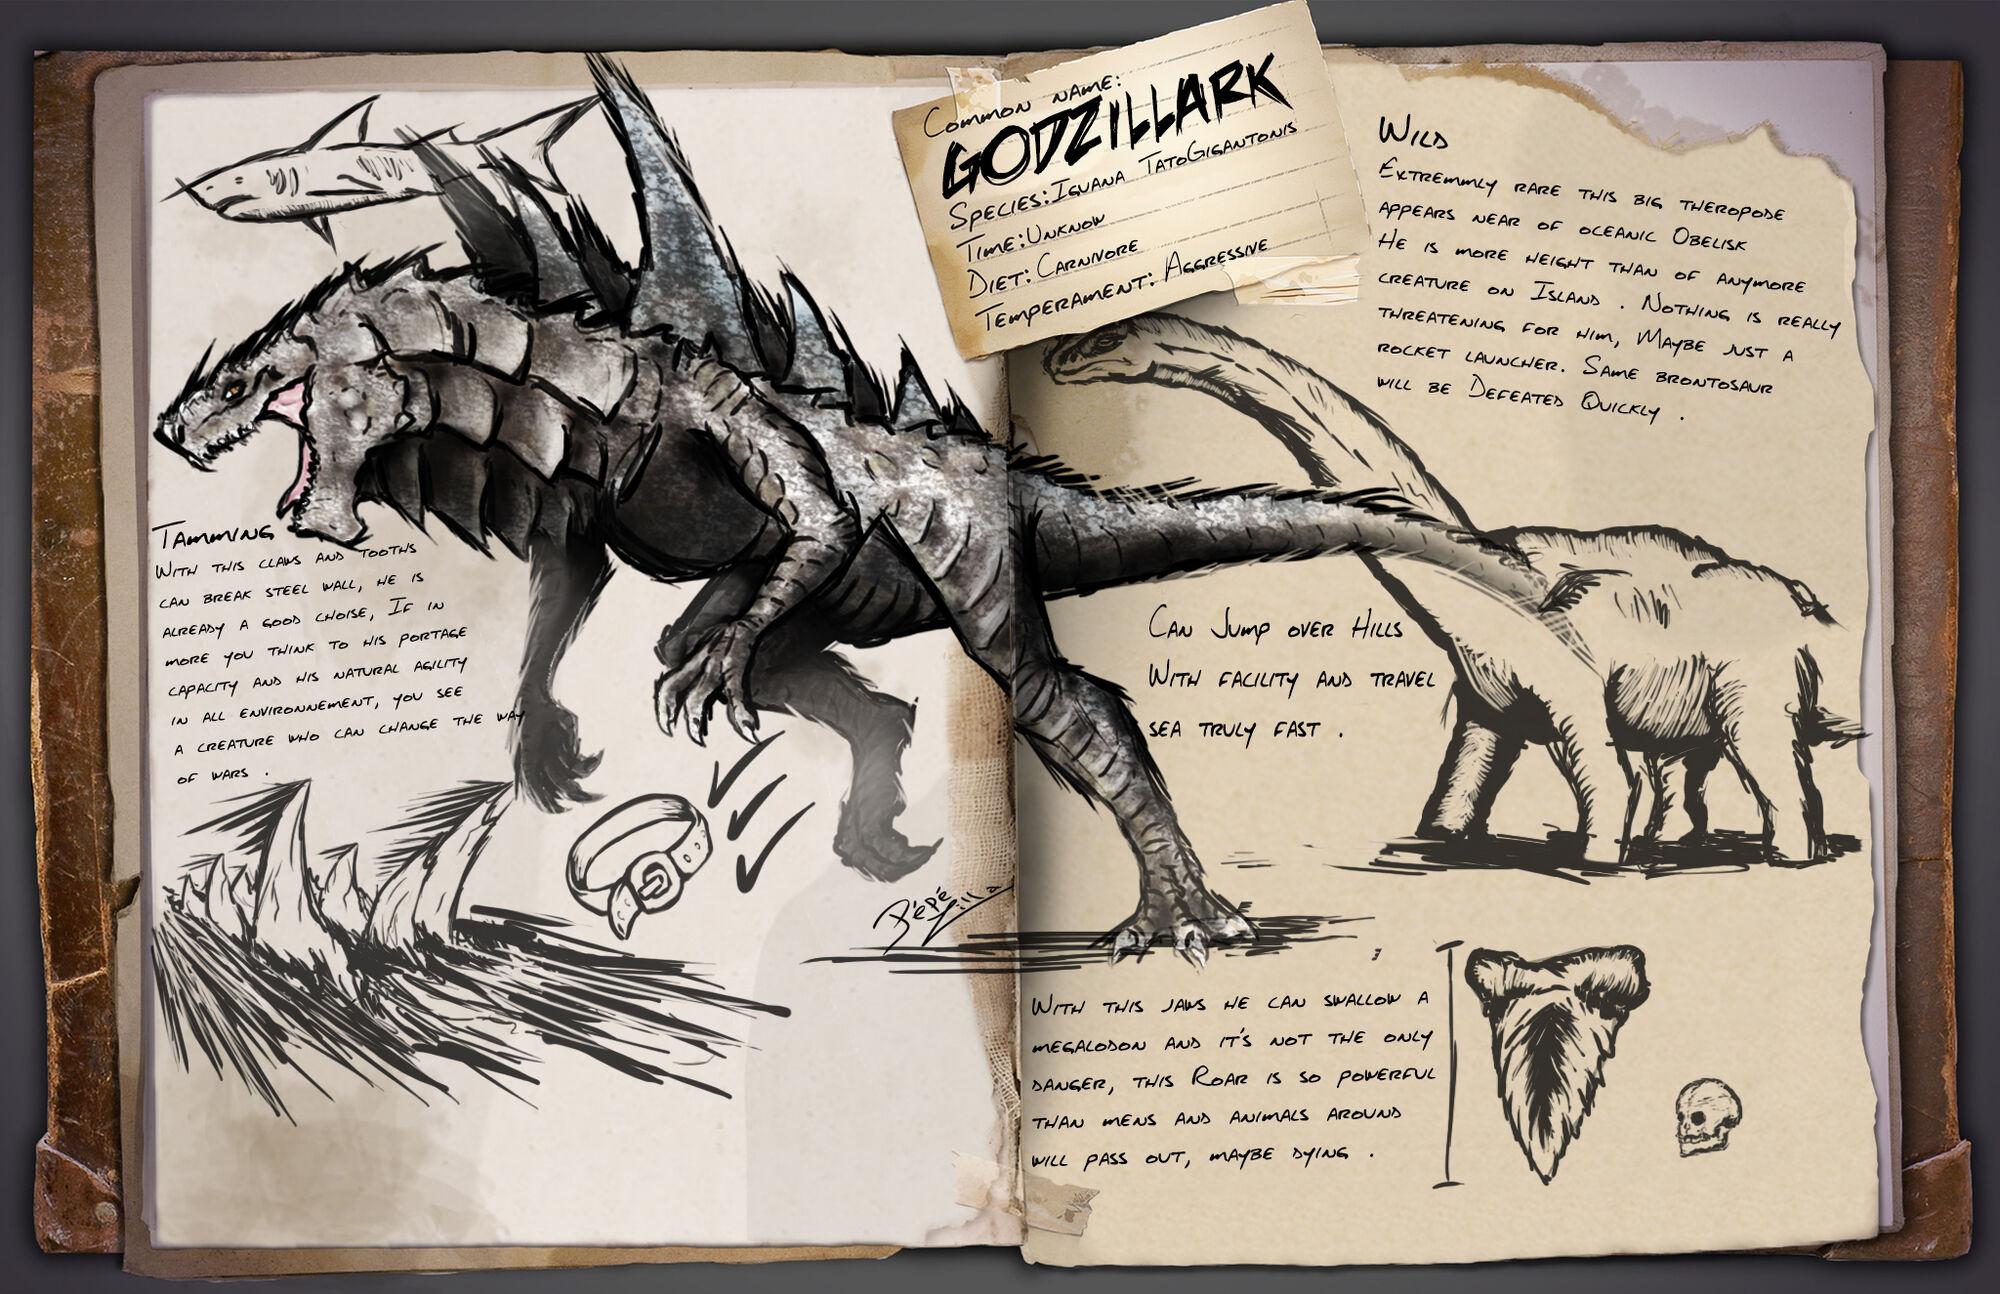 Mods/Godzilla (pepezilla) | ARK: Survival Evolved Wiki | FANDOM